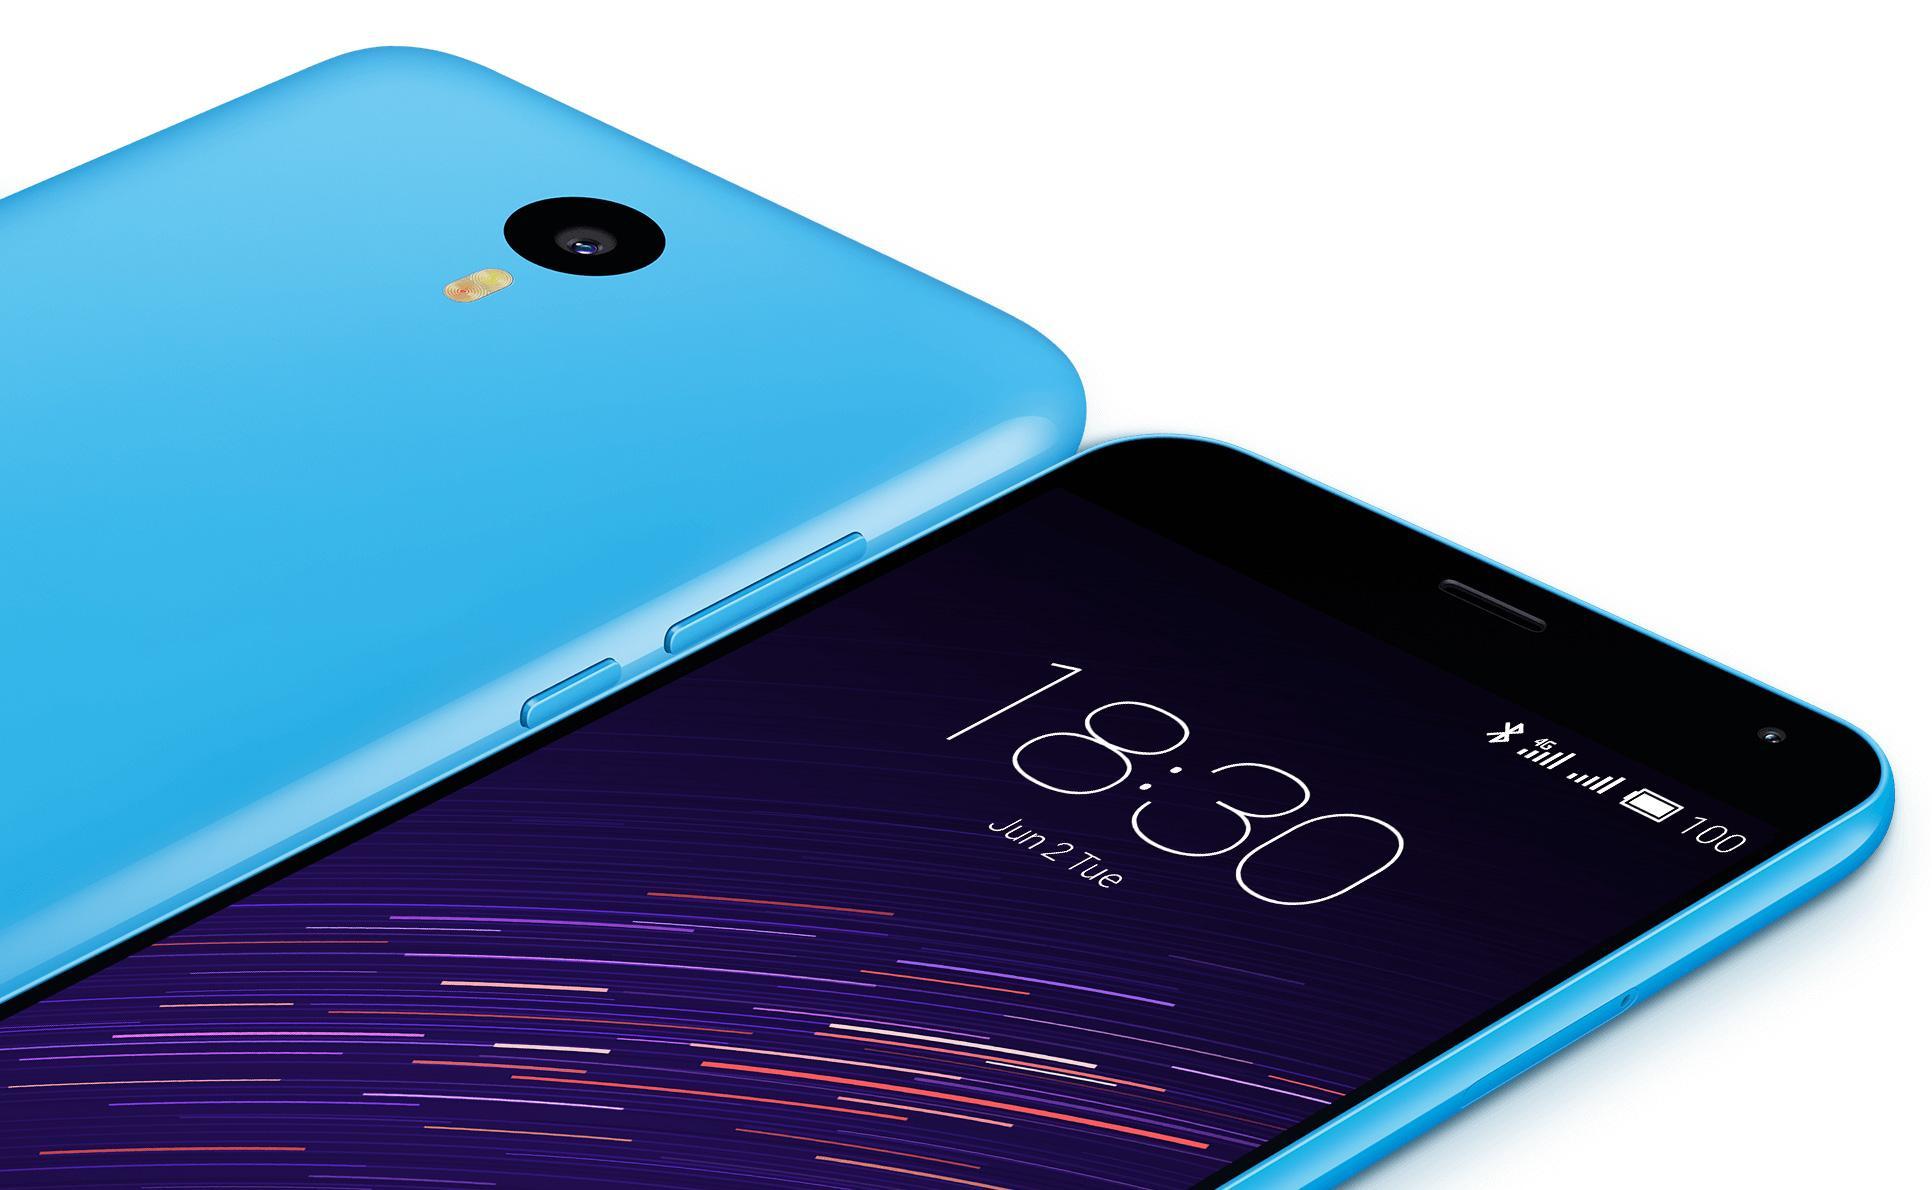 Meizu M2 Note de color azul